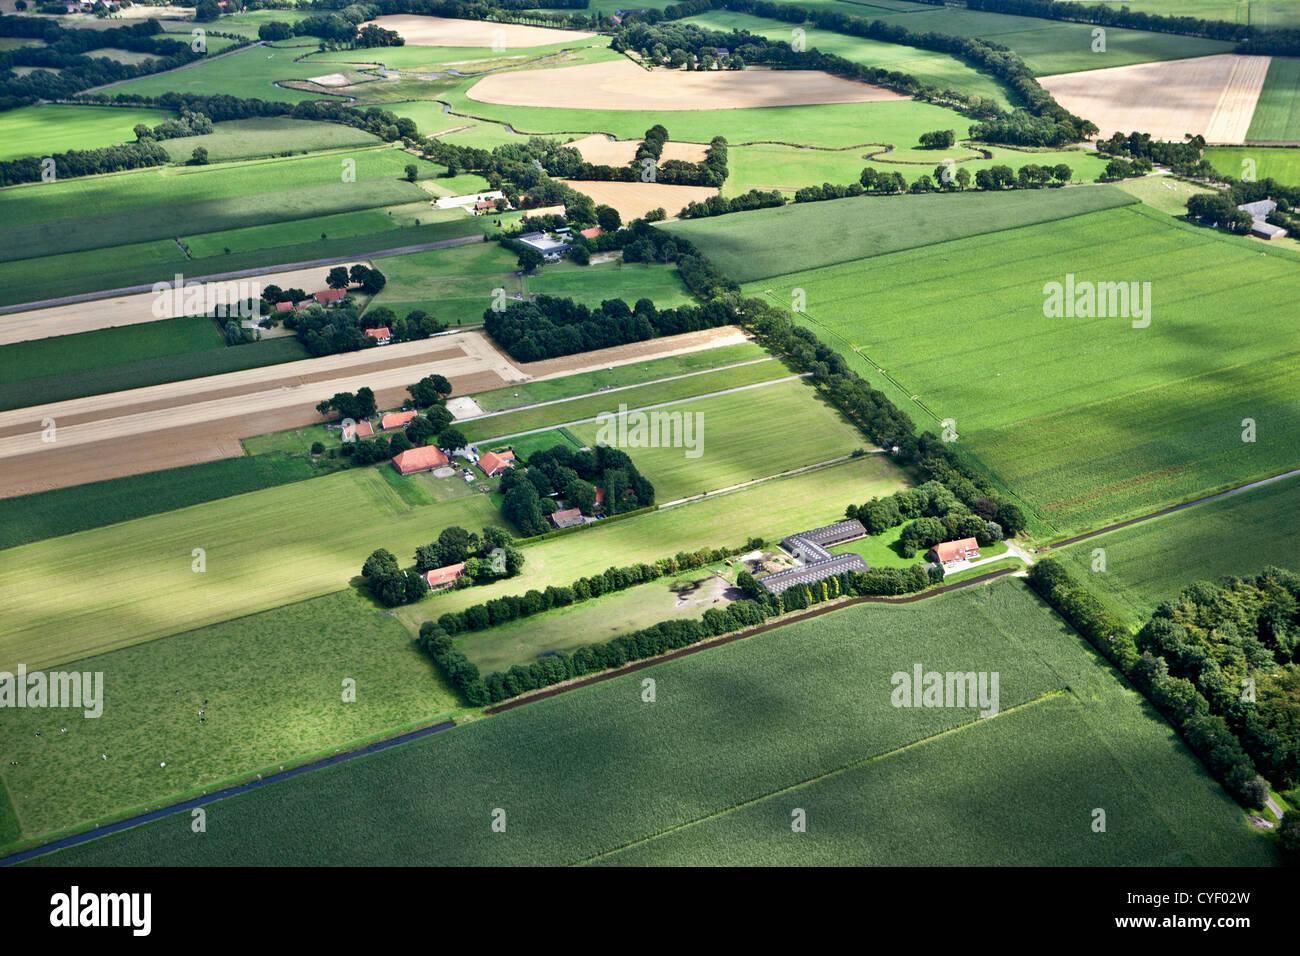 The Netherlands, Stadskanaal. Farms and farmland. Aerial. - Stock Image